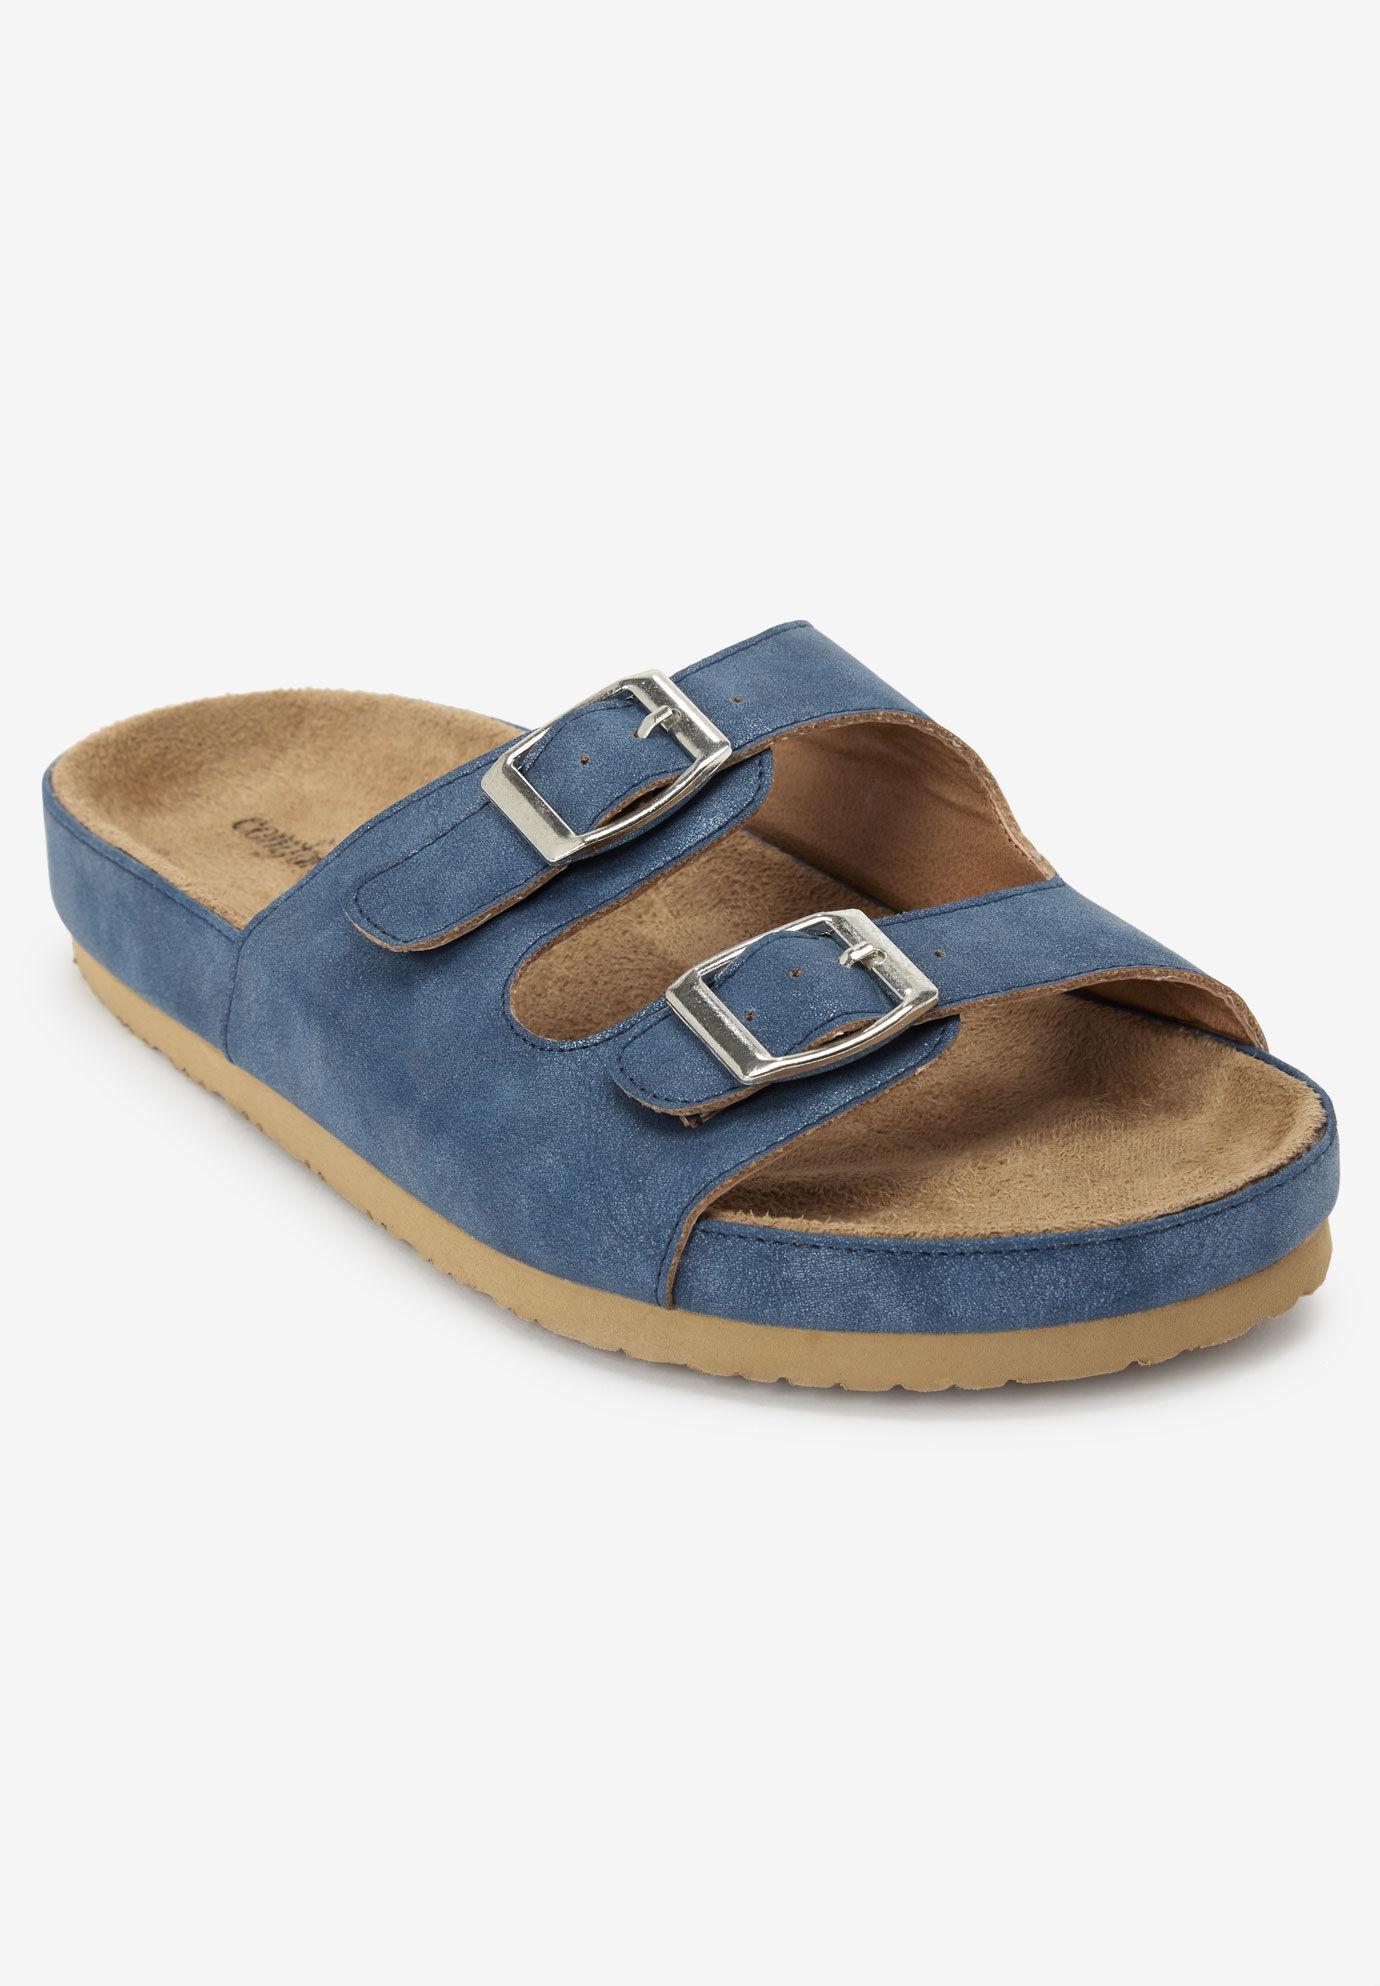 Wide Width Sport Sandals   One Stop Plus